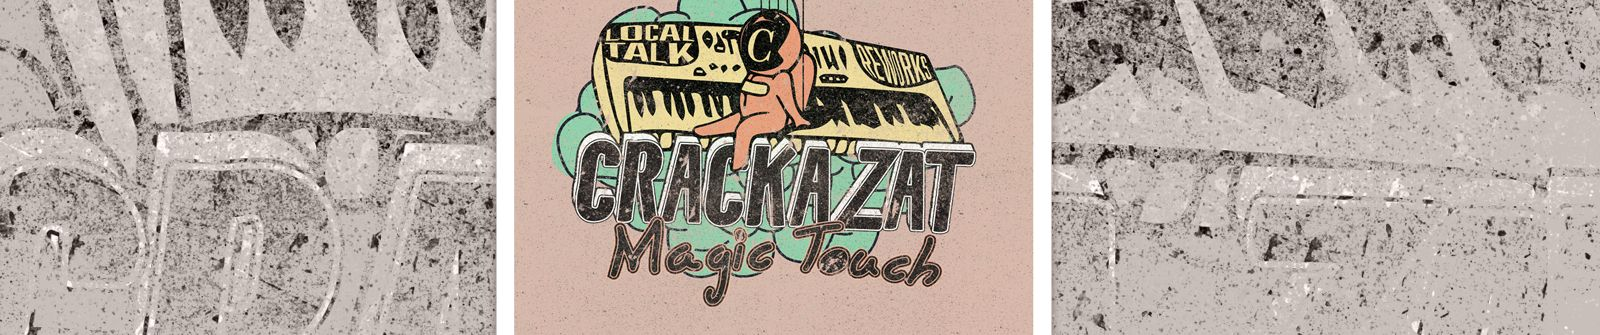 Crackazat | Free Listening on SoundCloud